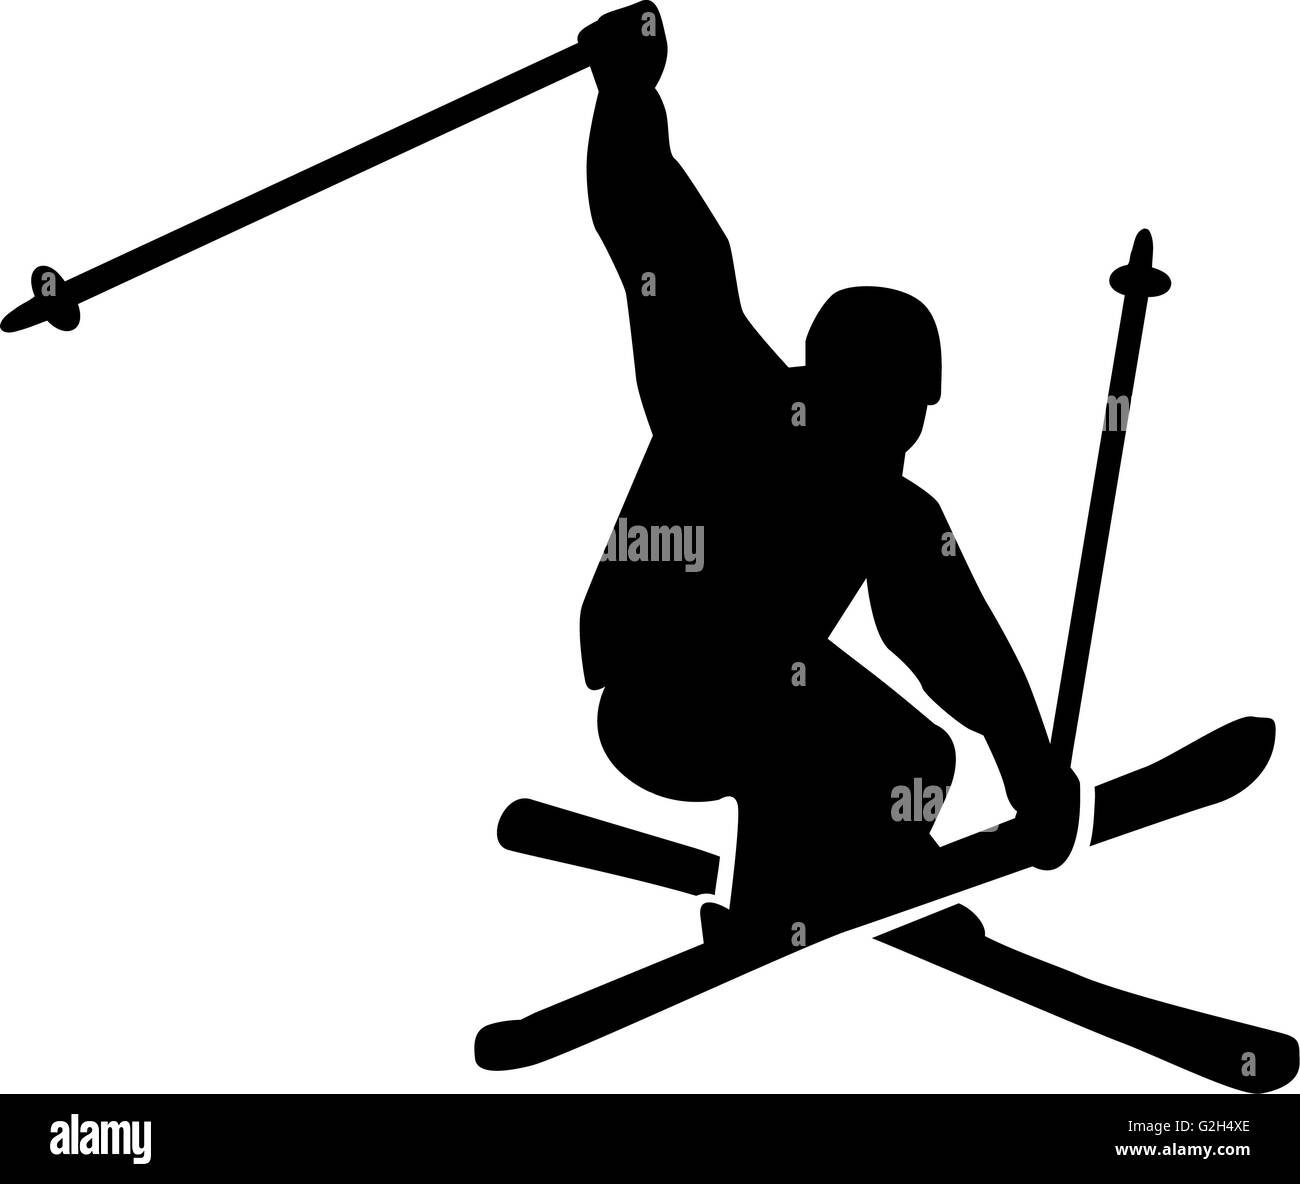 Ski Jumping Freestyle - Stock Image